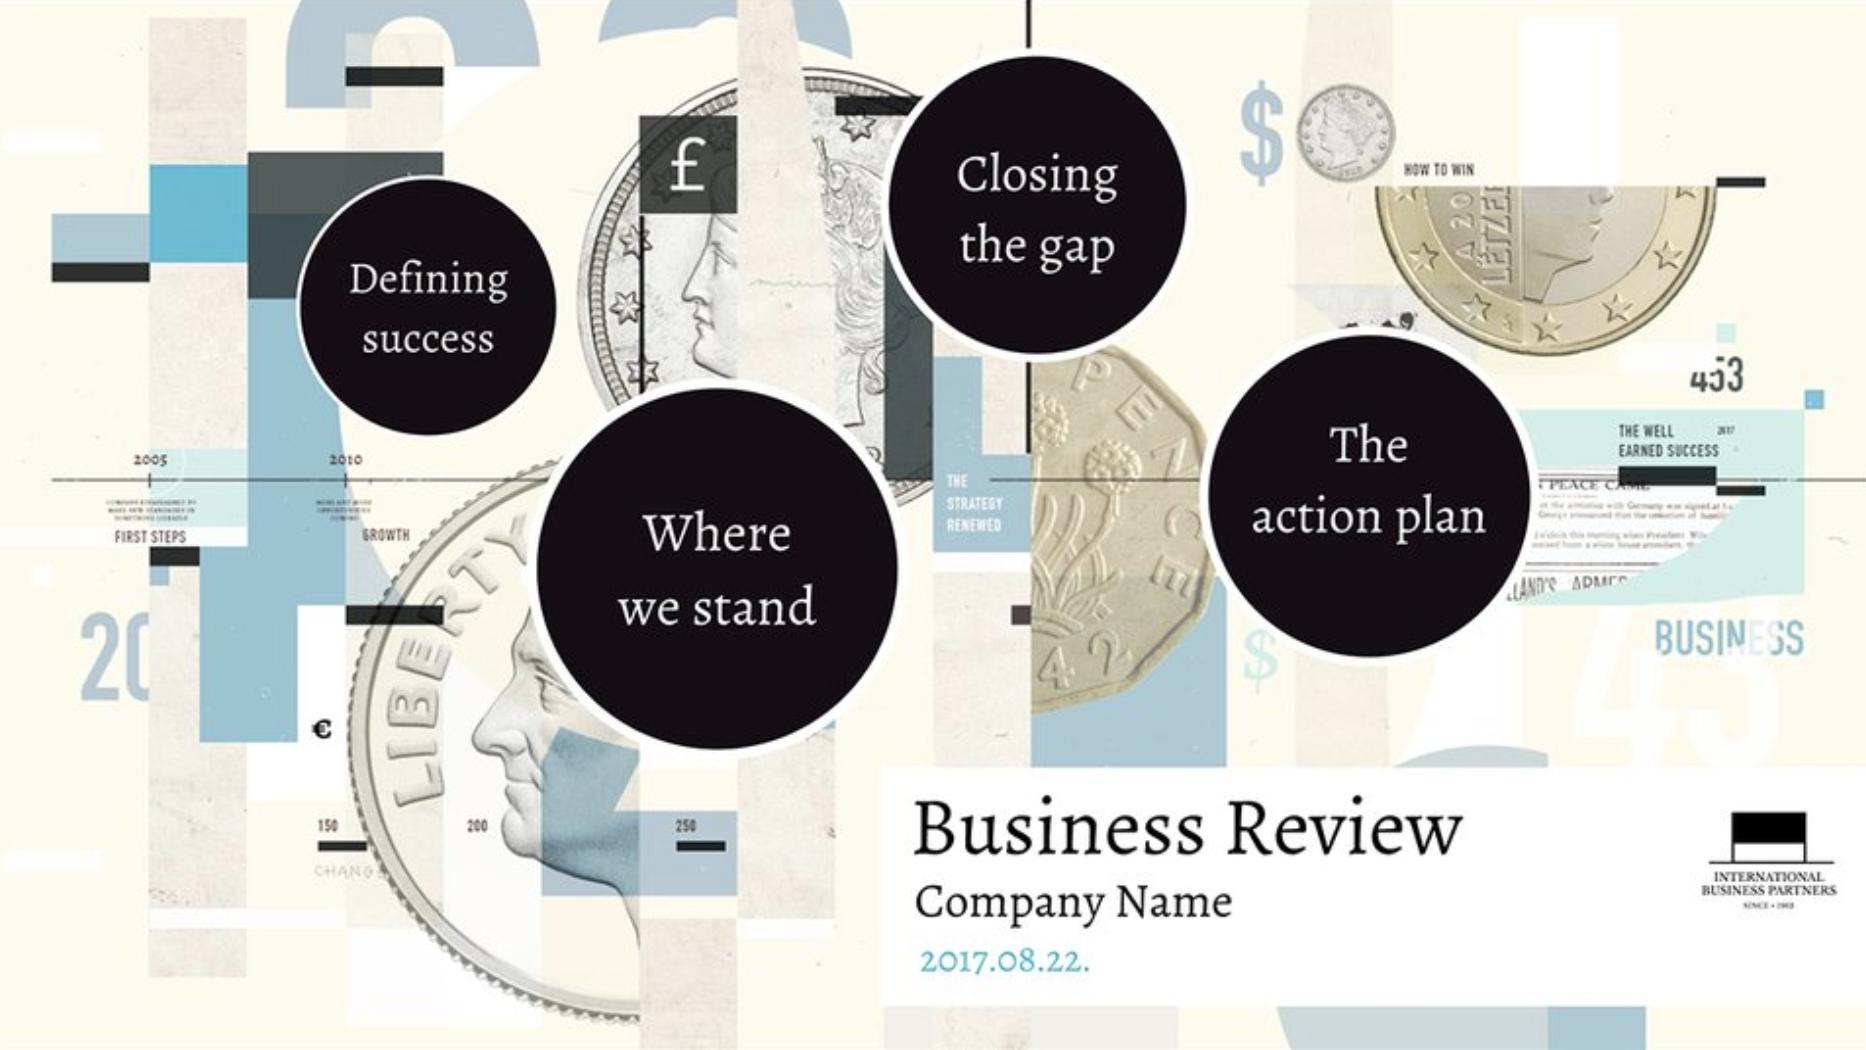 5 Prezi Next templates for your next business review | Prezi Blog